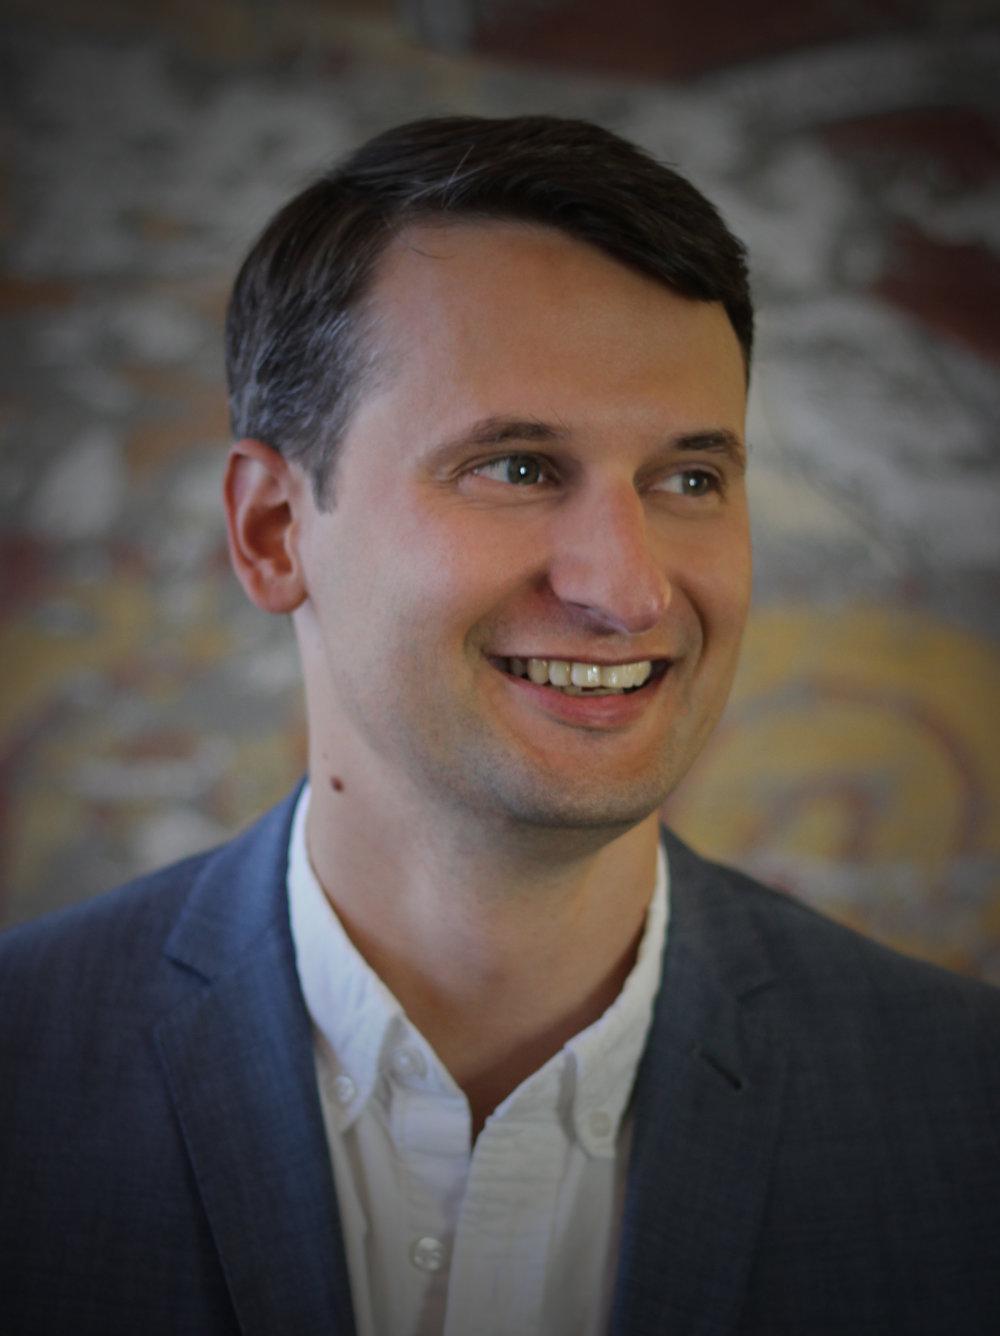 MICHAEL JUCKIEWICZ